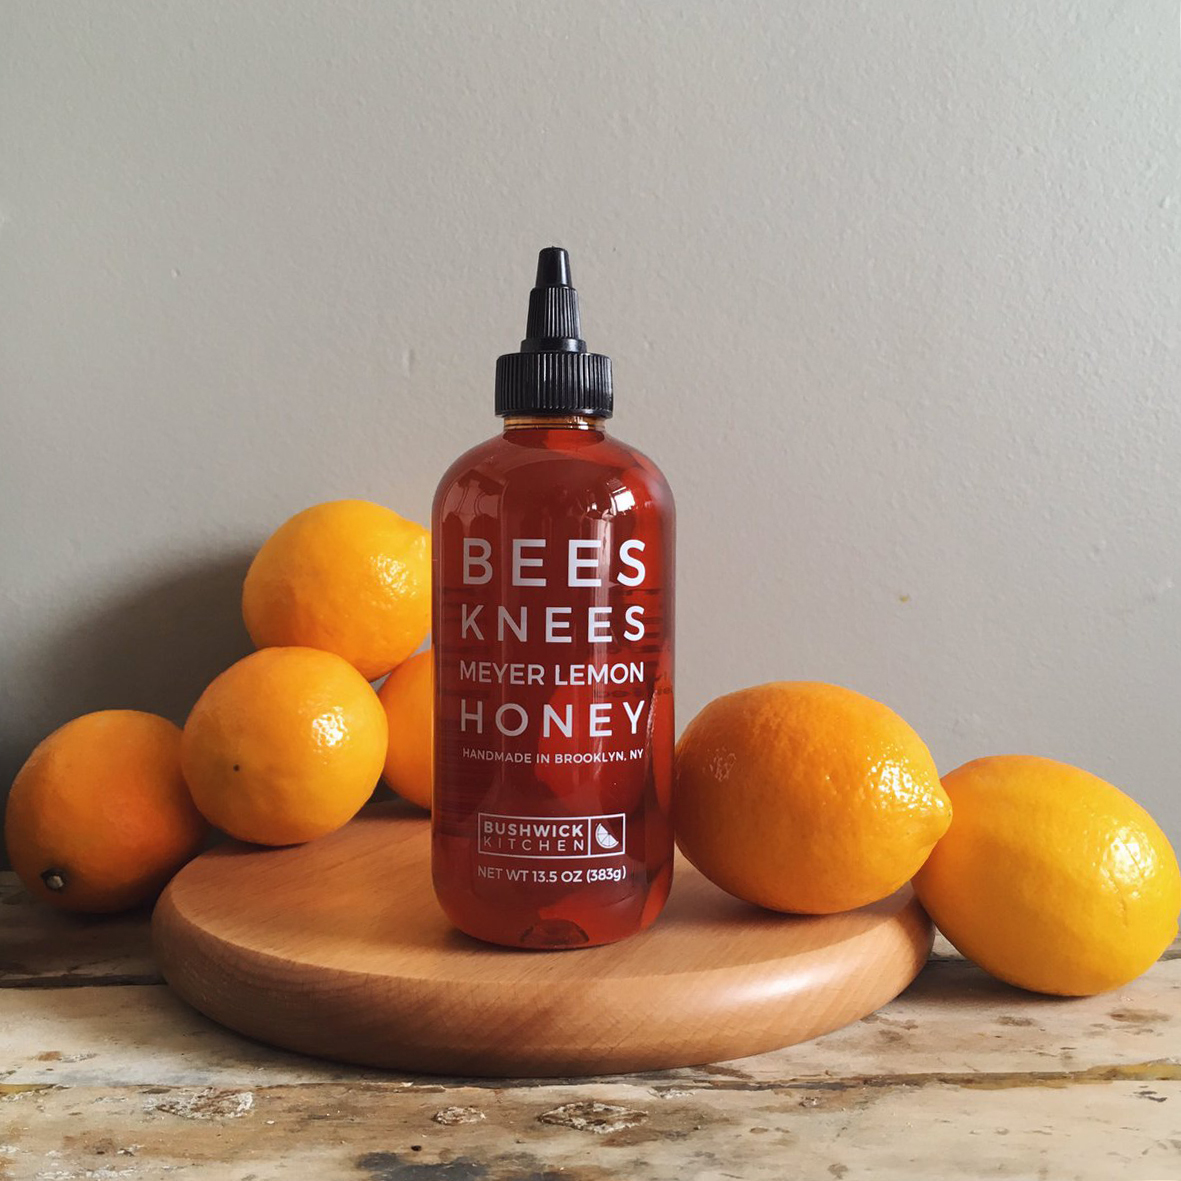 Bushwick Kitchen Bees Knees Meyer Lemon Honey